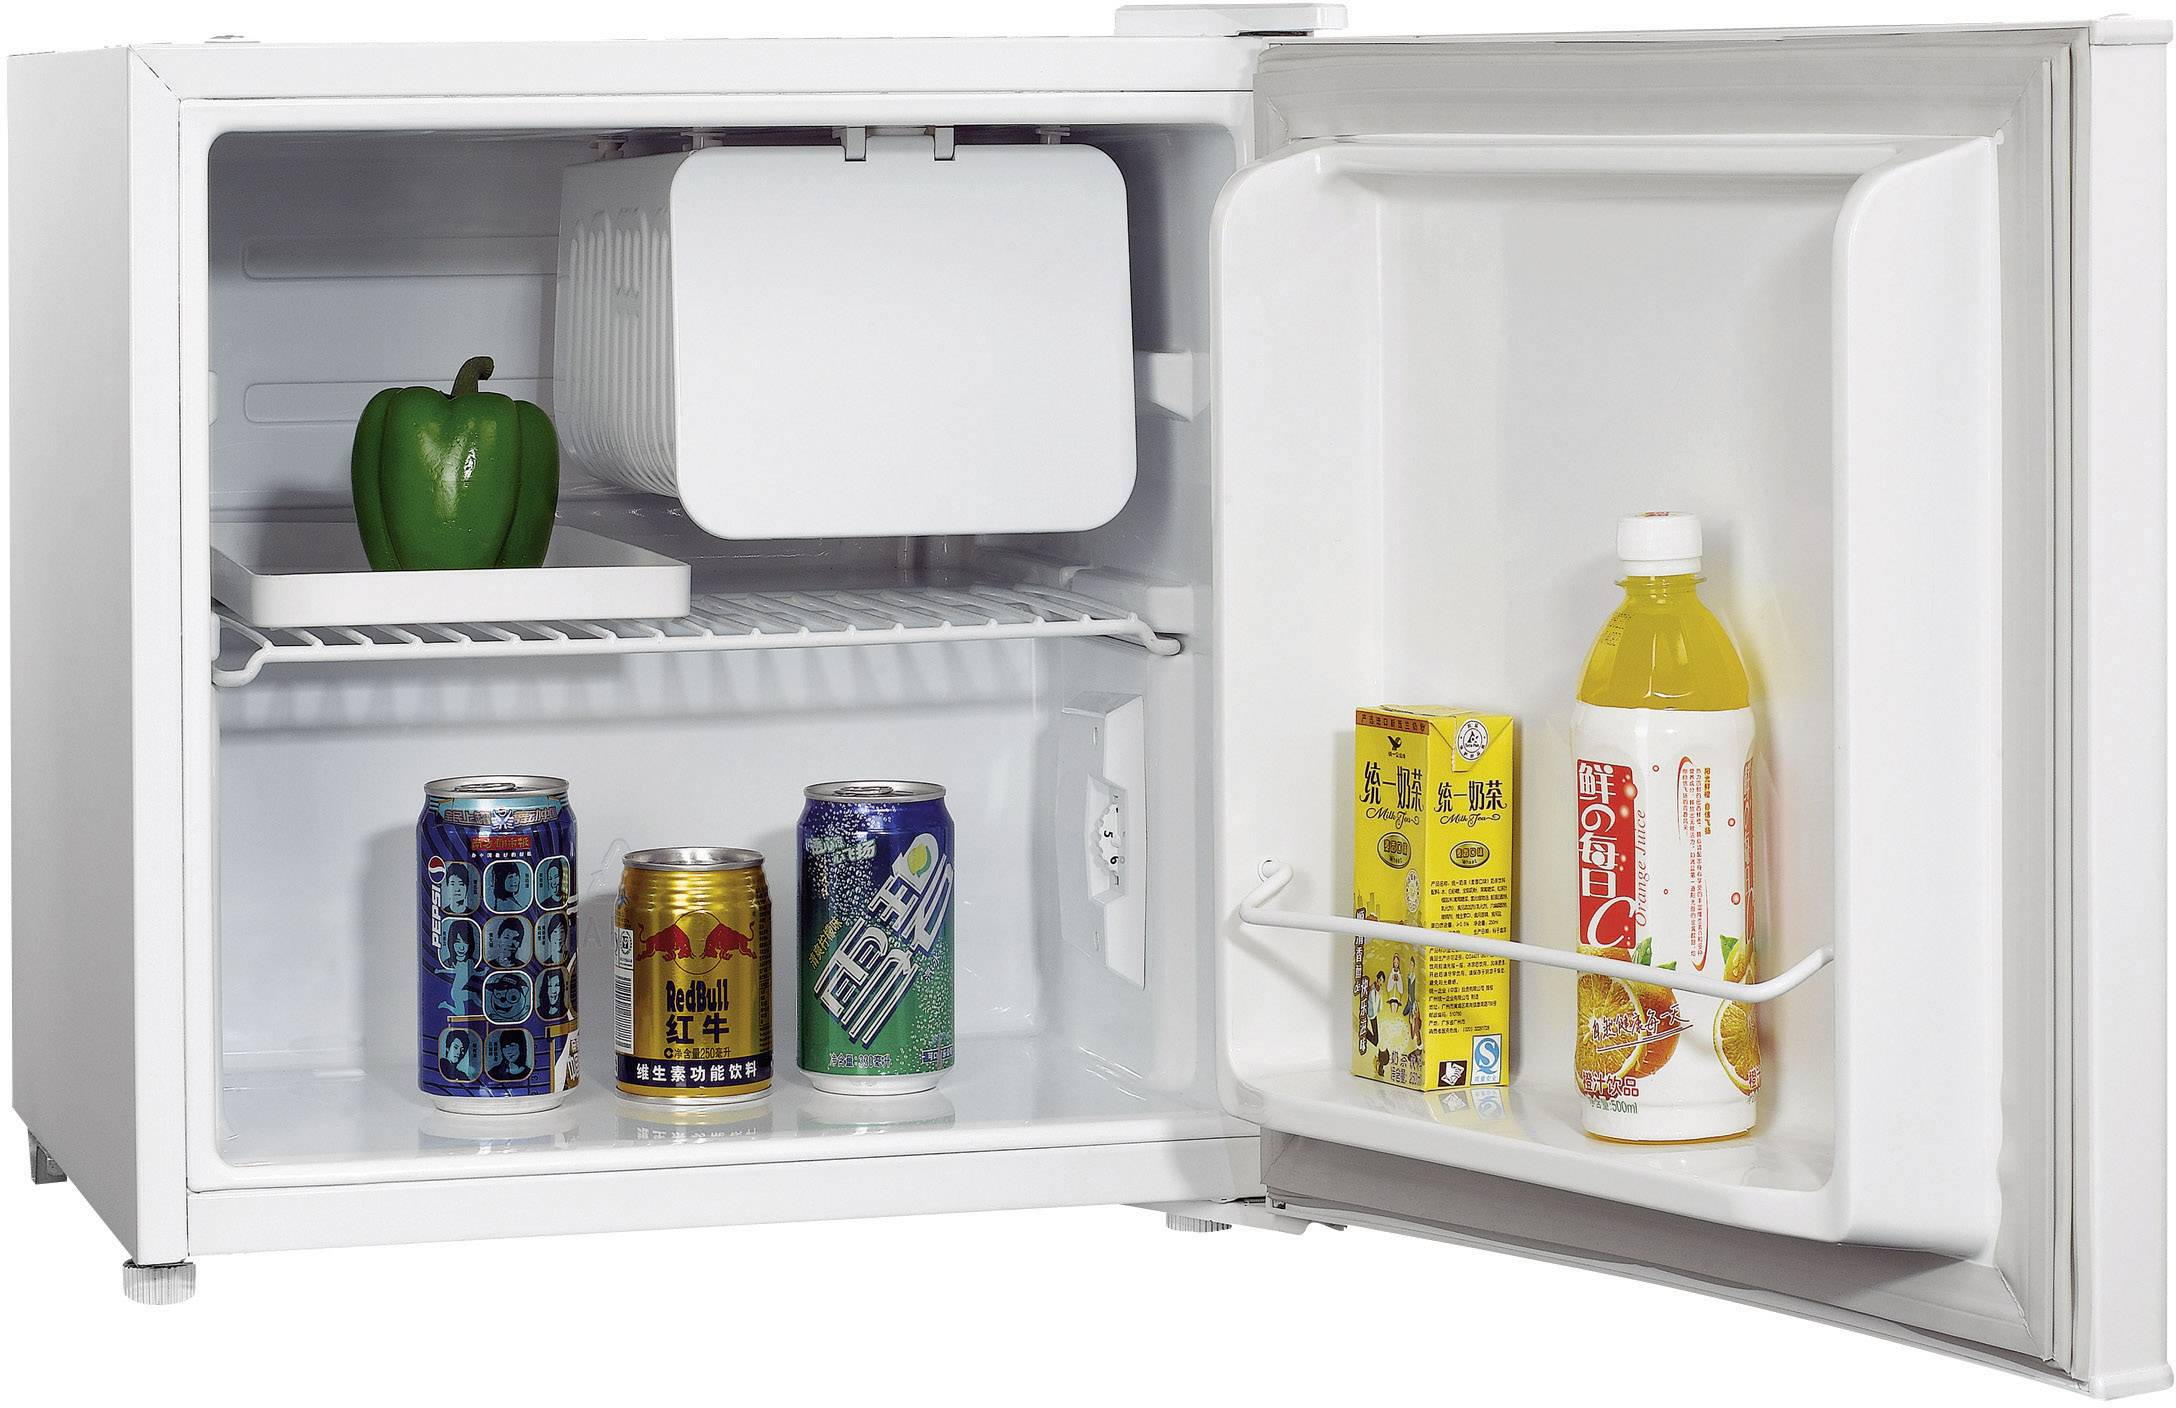 Mini Kühlschrank Zubehör : Kompakter mini kühlschrank l inventor appliances